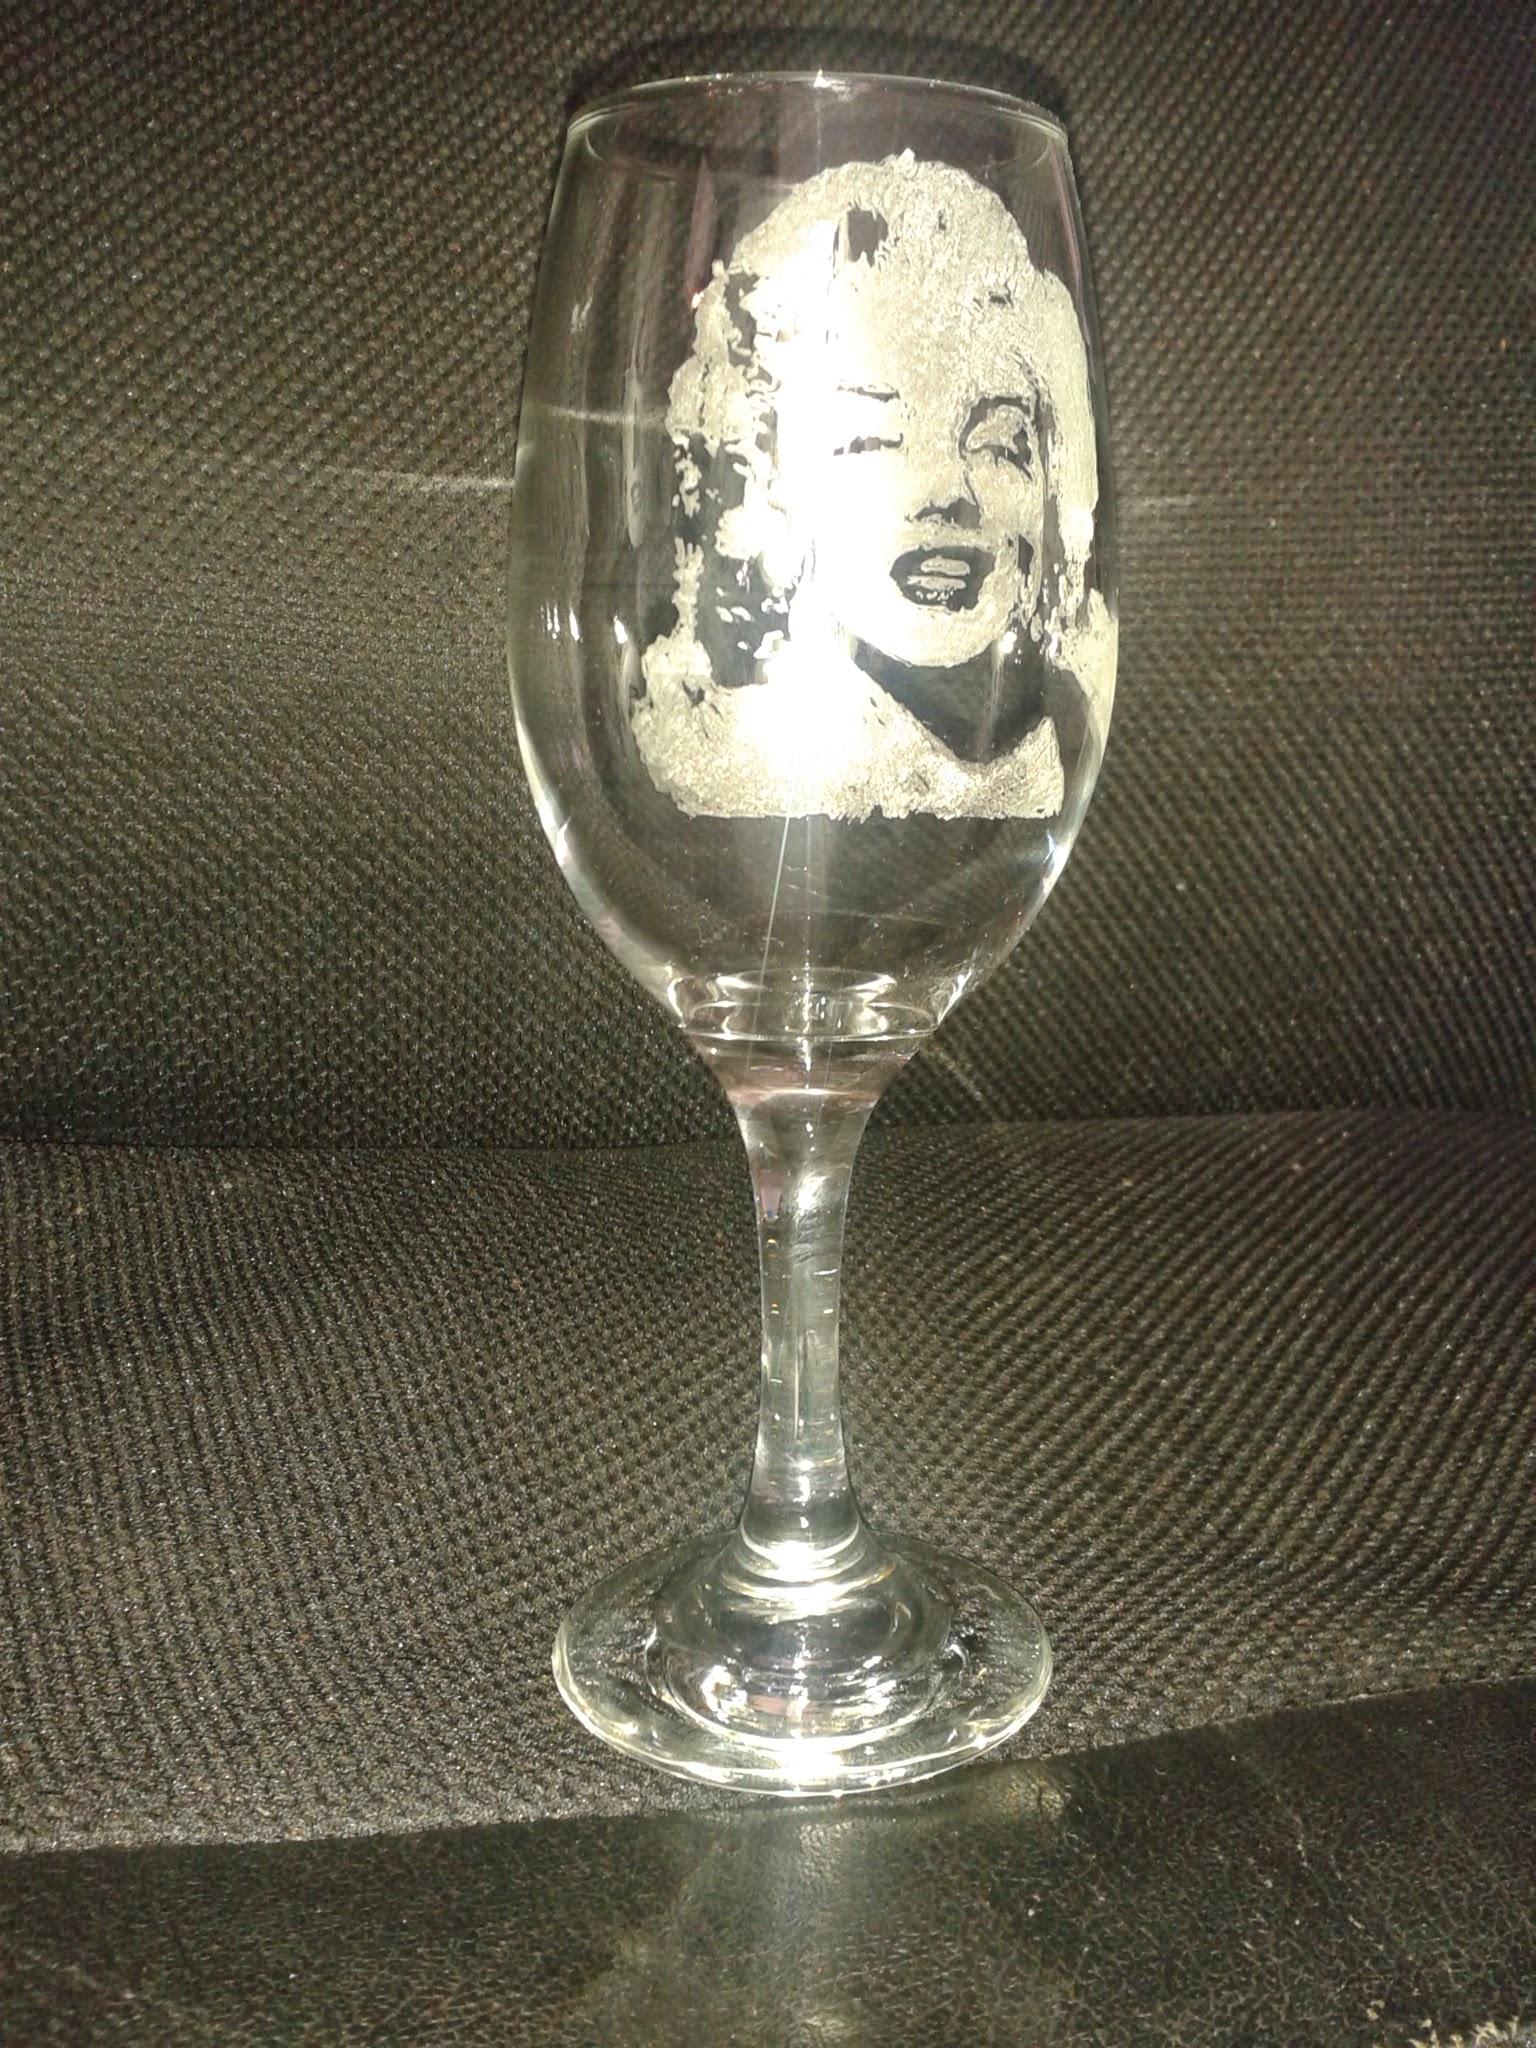 Glass engraving hobby, Glass engraving